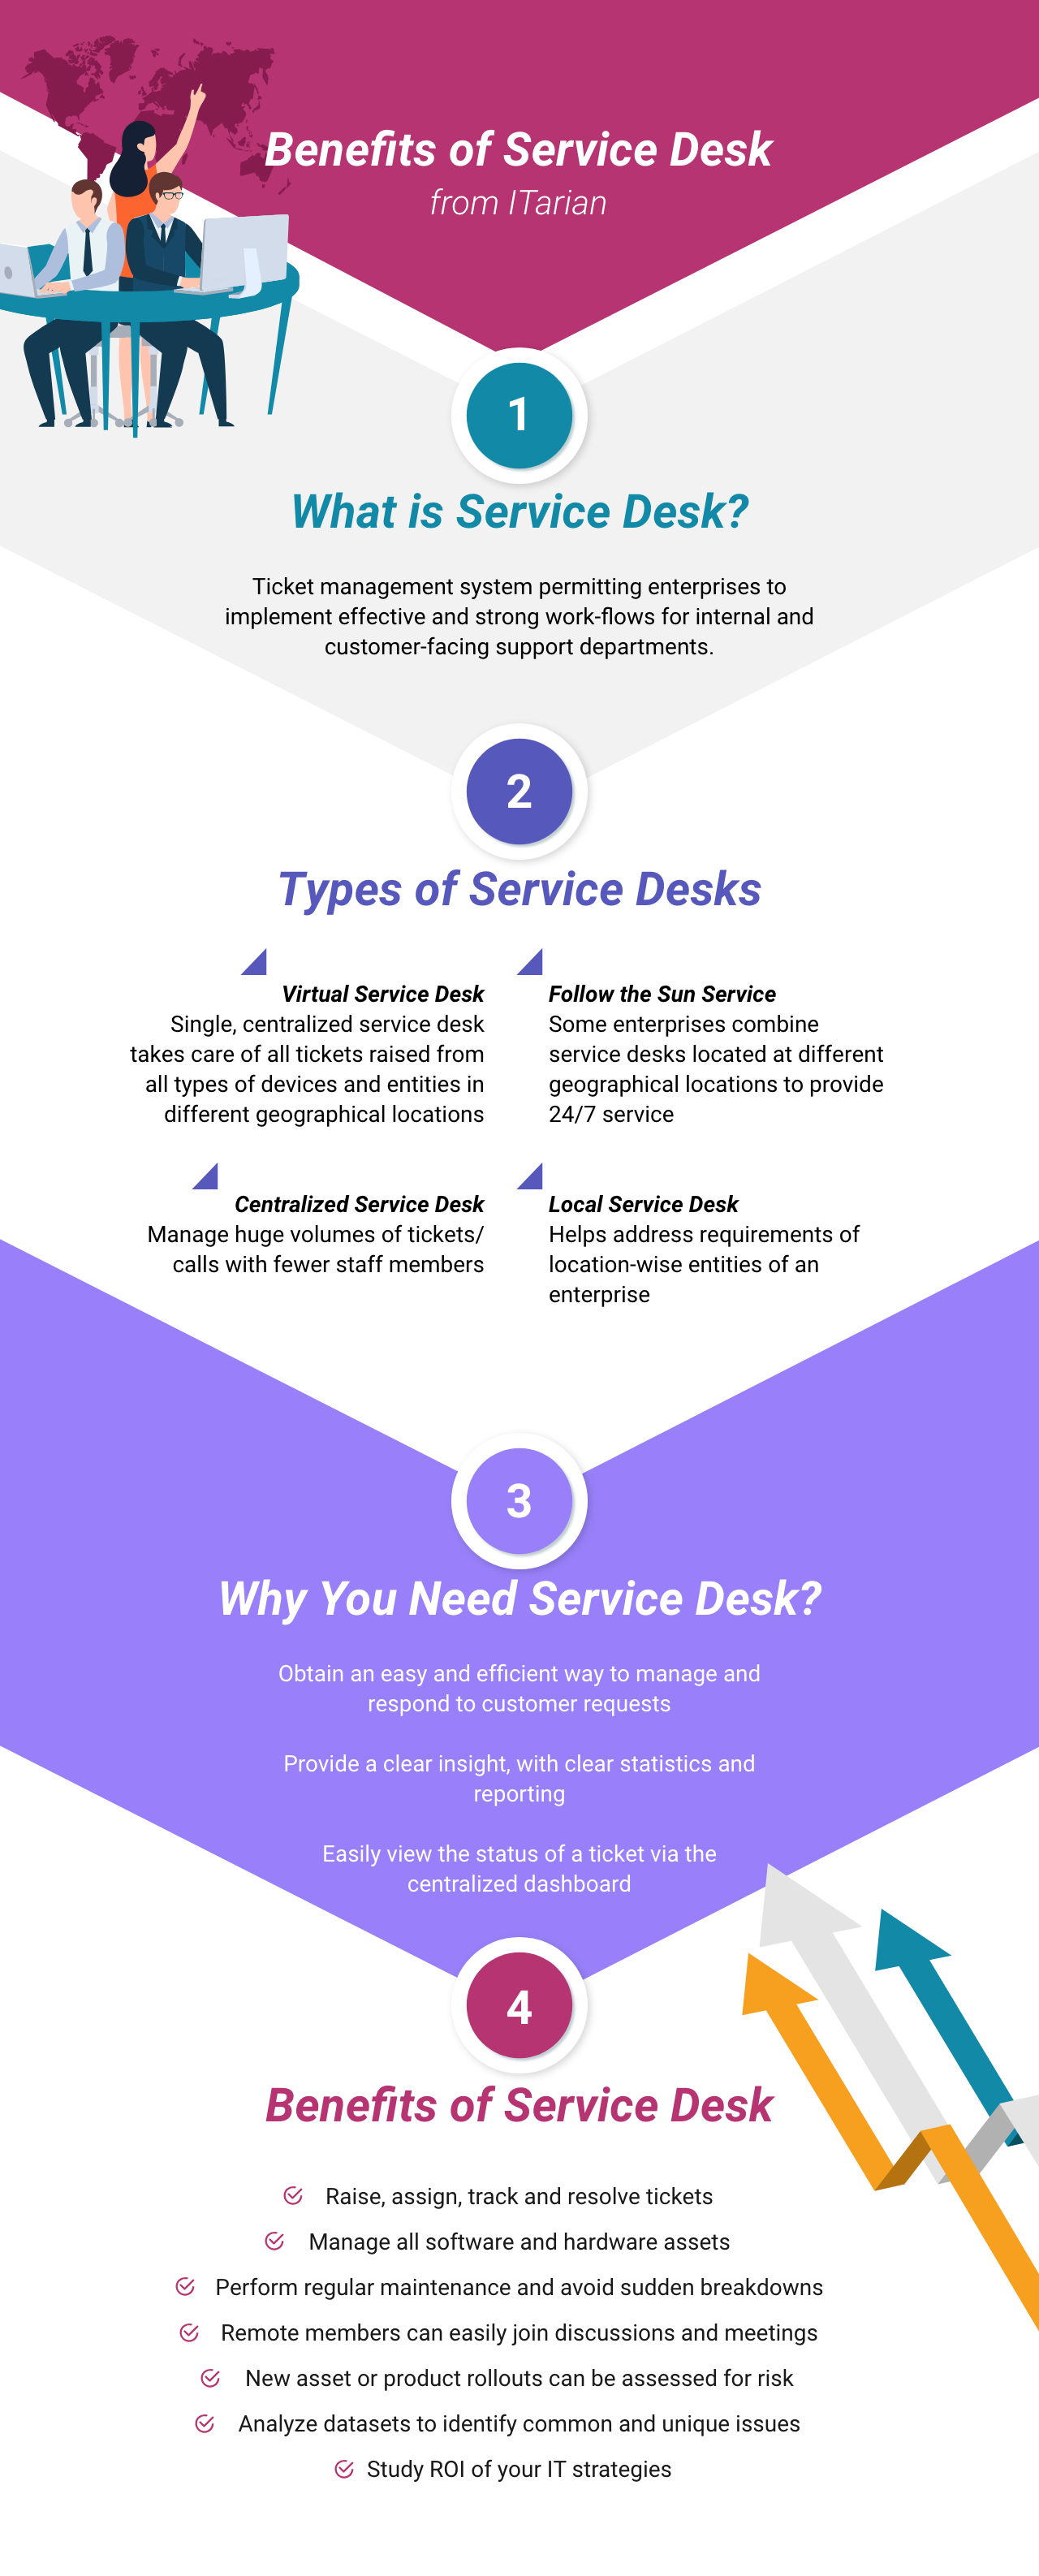 Pin by Isabella Jones - ITSM Expert on Service Desk in 2019